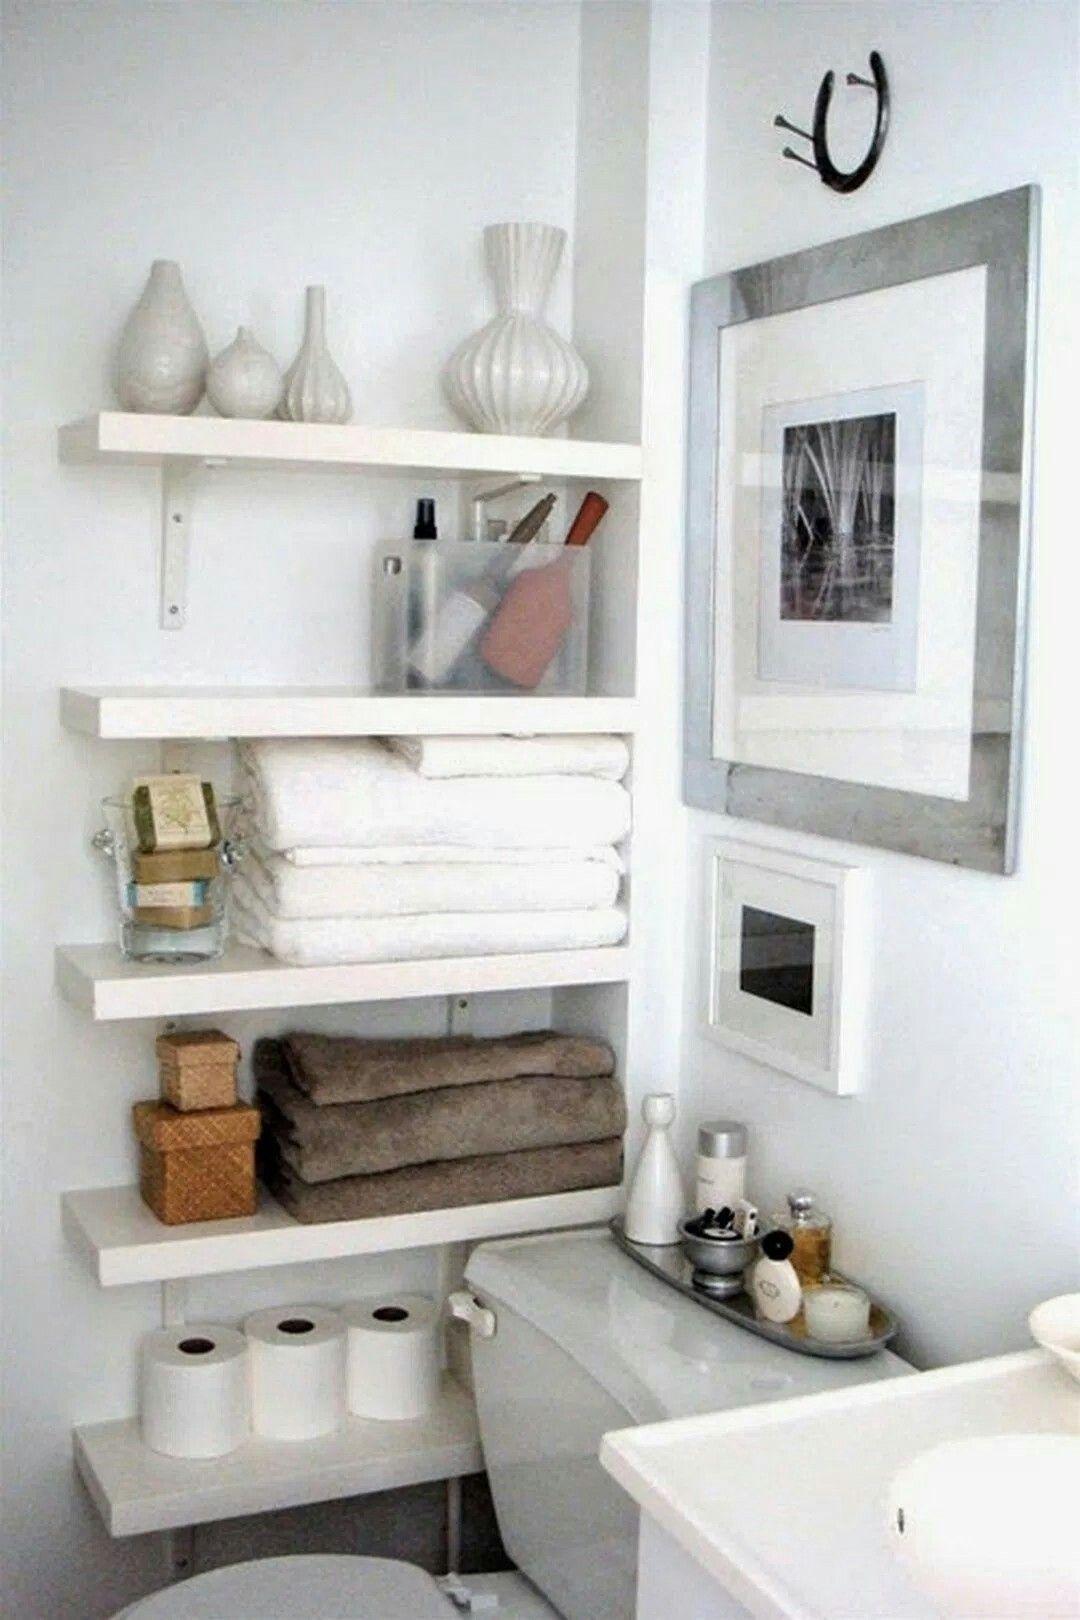 Pin by Jillian Kopkowski on Bathroom | Pinterest | Small apartments ...